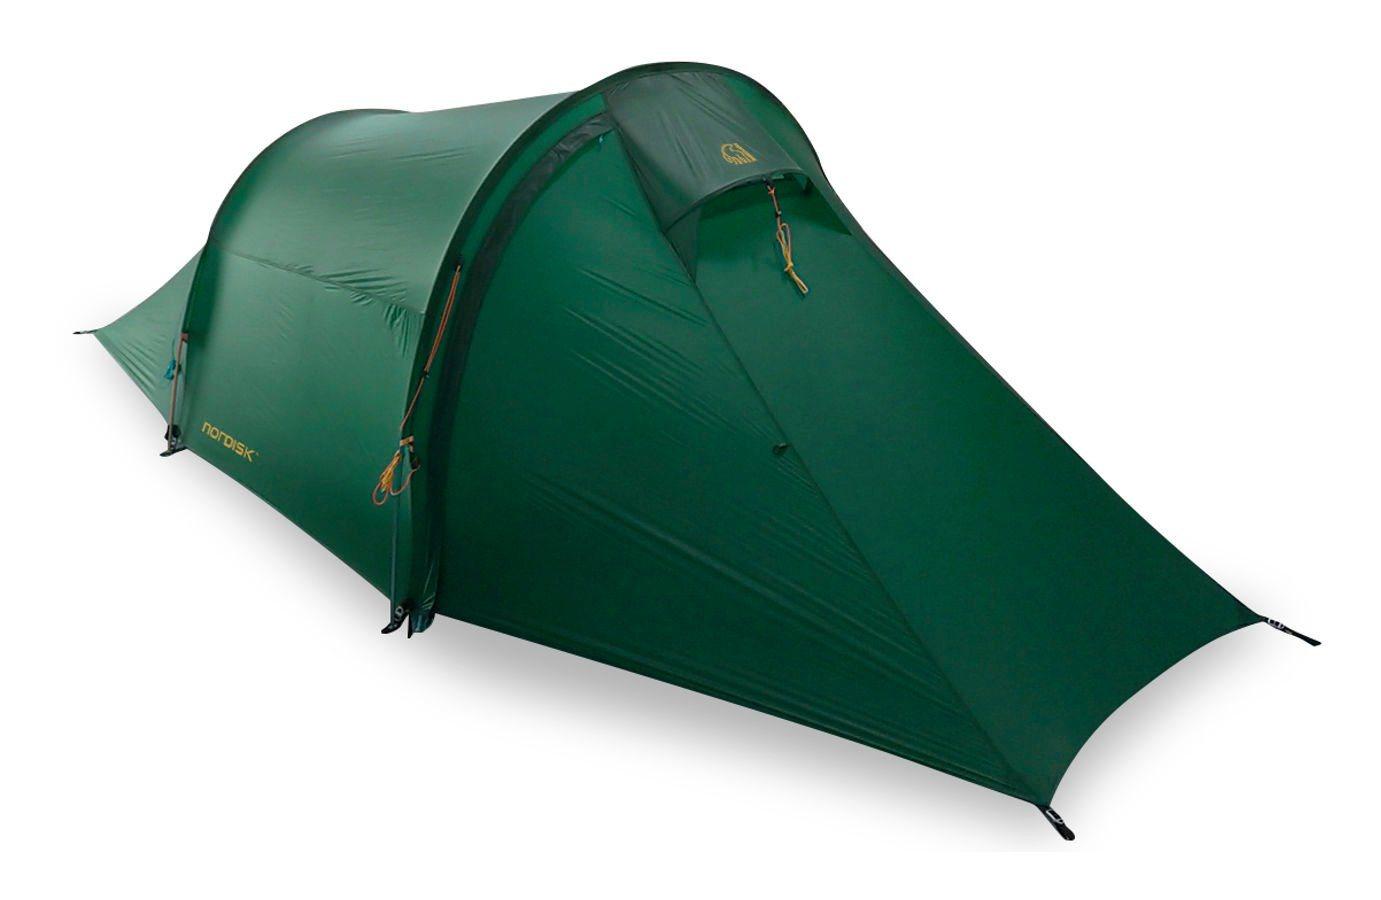 Nordisk Zelt »Halland 2 Light Weight SI Tent«